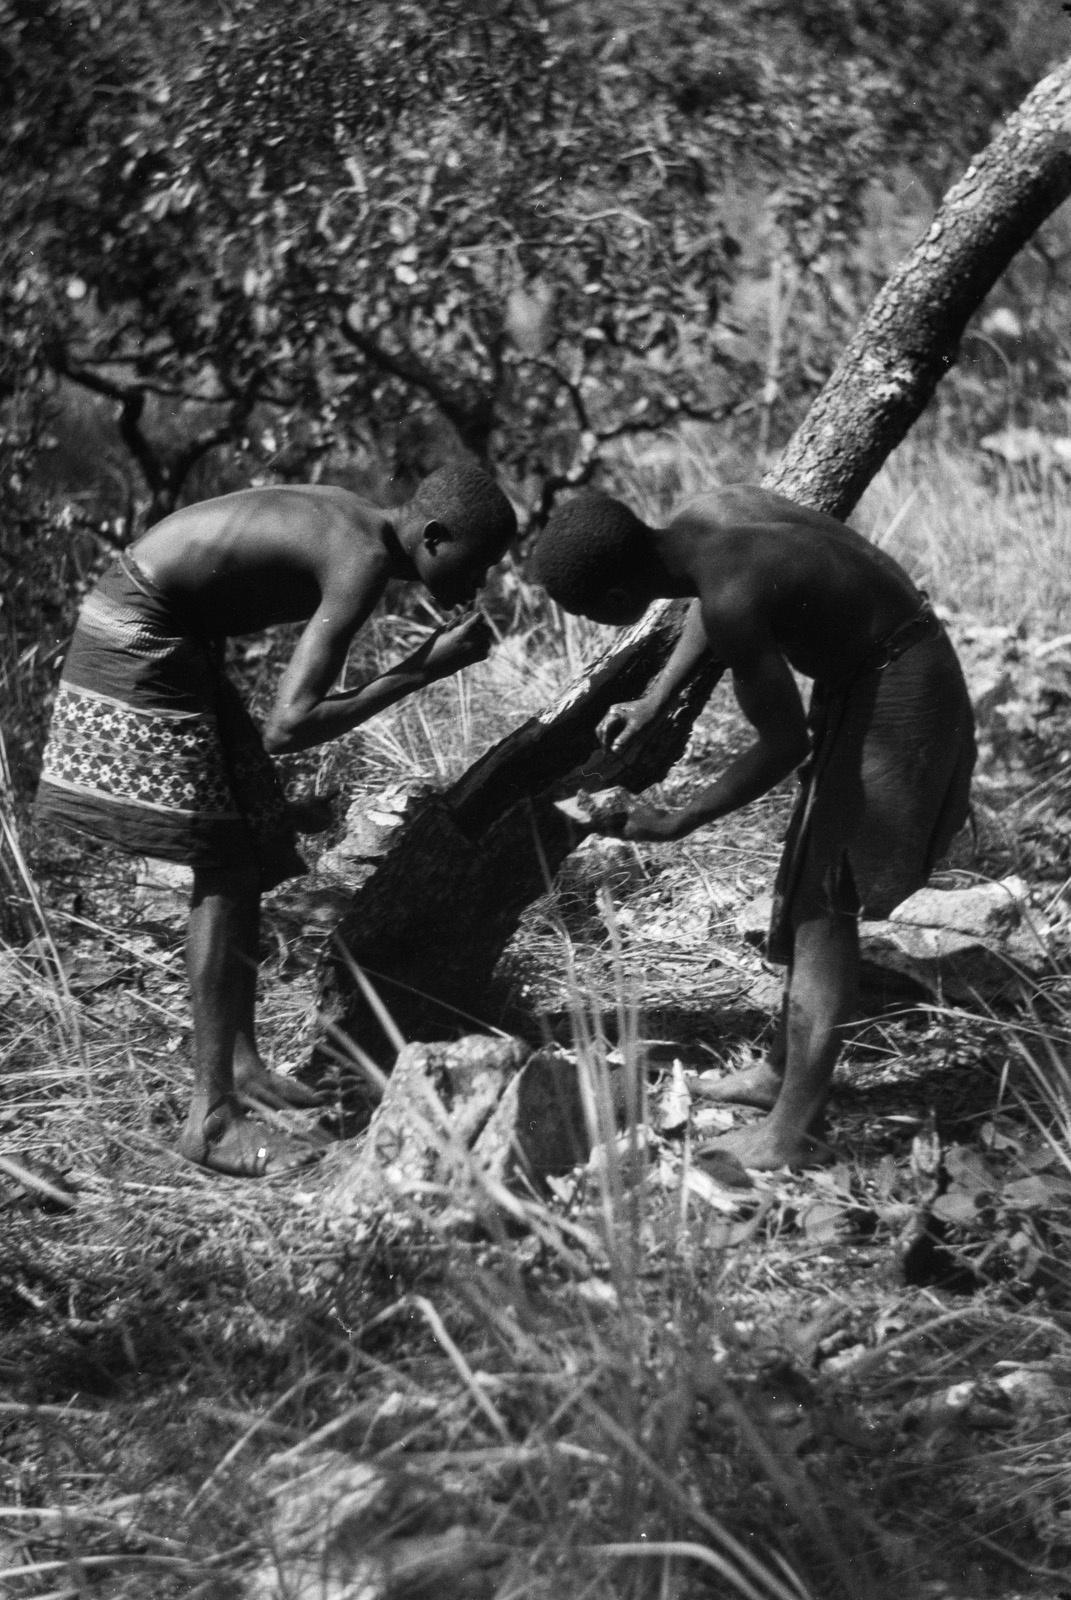 Между Капири Мпоши и рекой Лунсемфва. Двое мужчин собирают мед из улья диких пчел